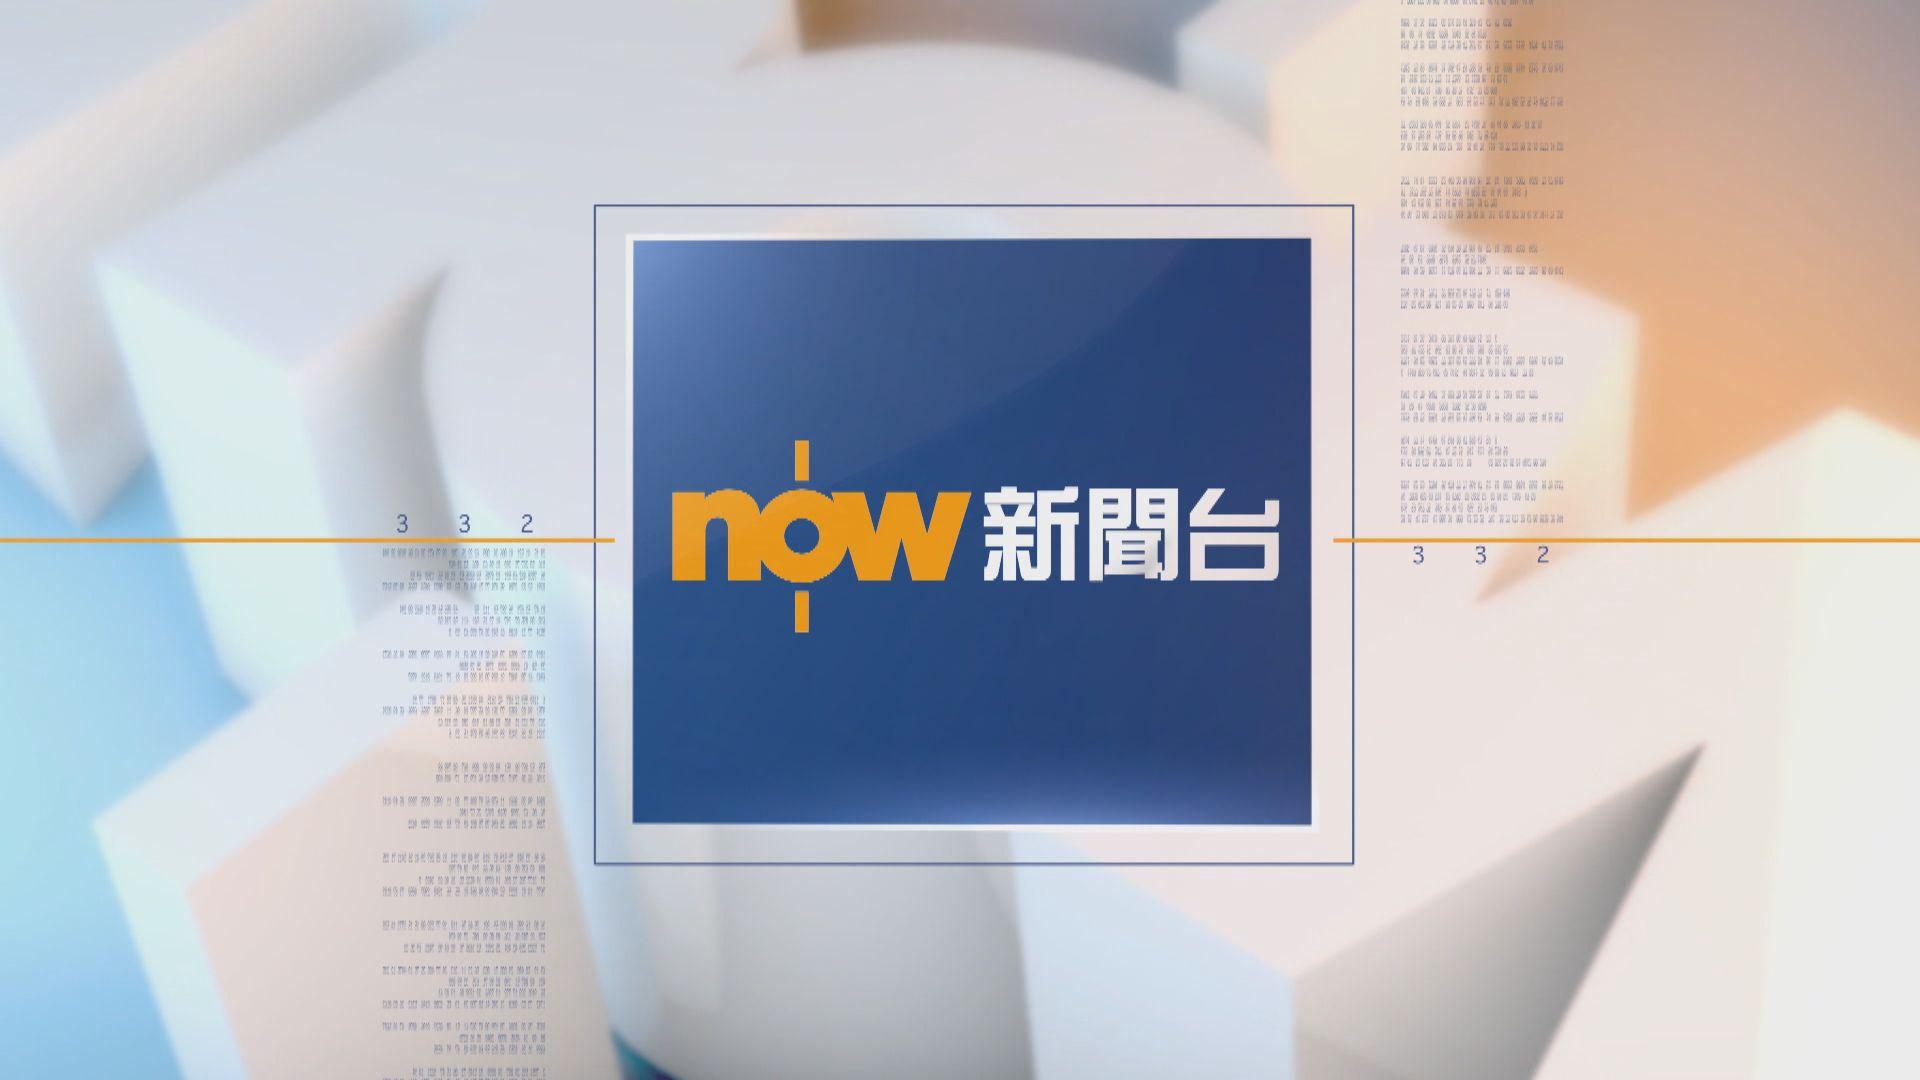 【招聘啟事】Online News Editor